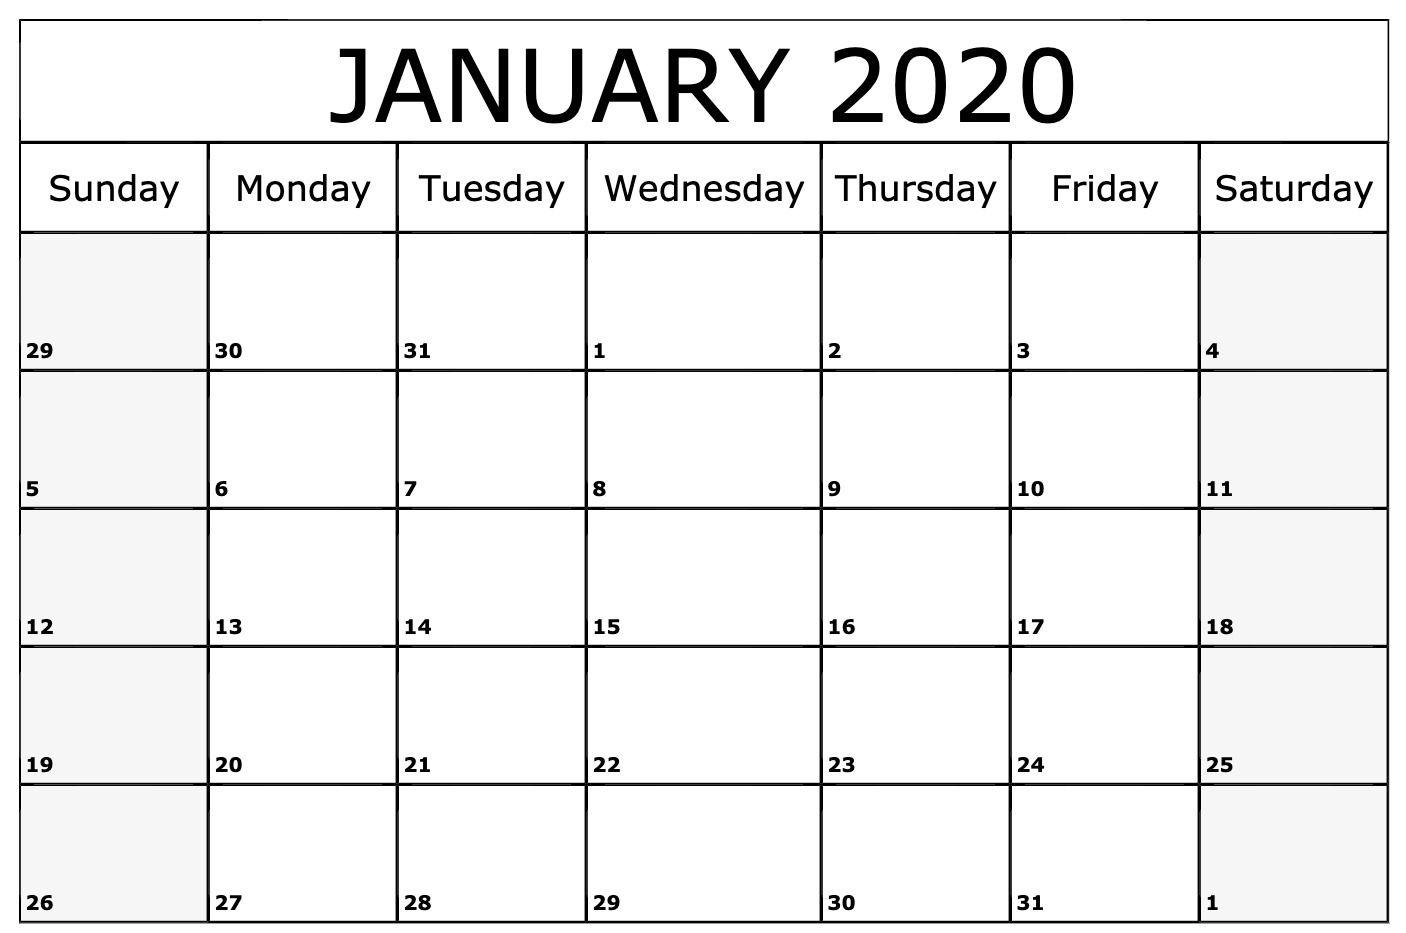 Free January 2020 Calendar Pdf, Word, Excel Printable